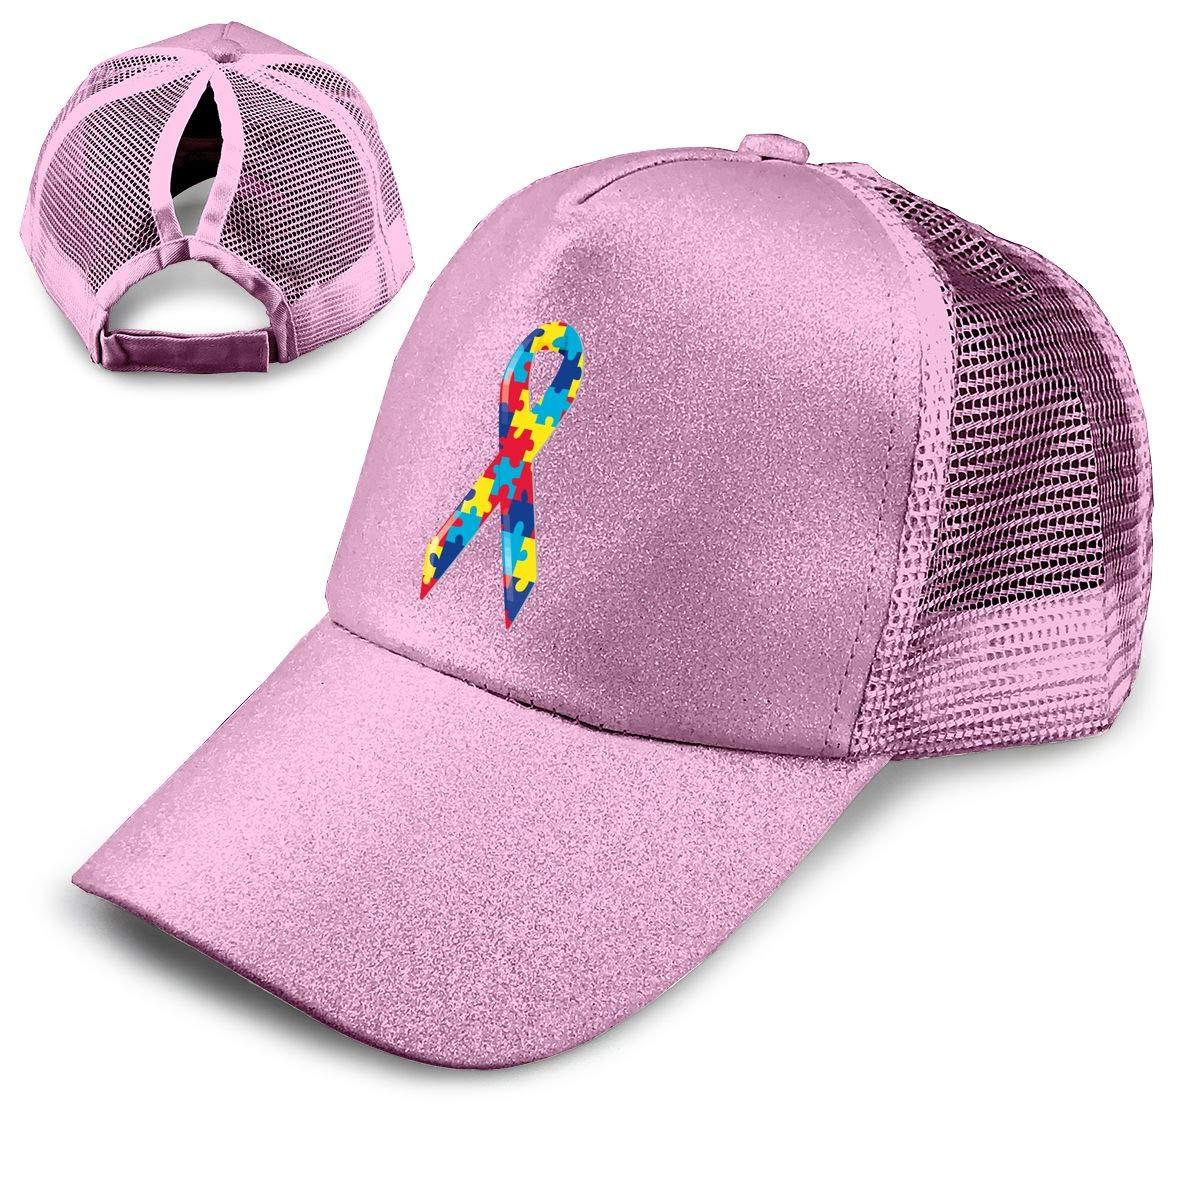 Autism Awareness Ribbon Ponytail Messy High Bun Hat Ponycaps Baseball Cap Adjustable Trucker Cap Mesh Cap